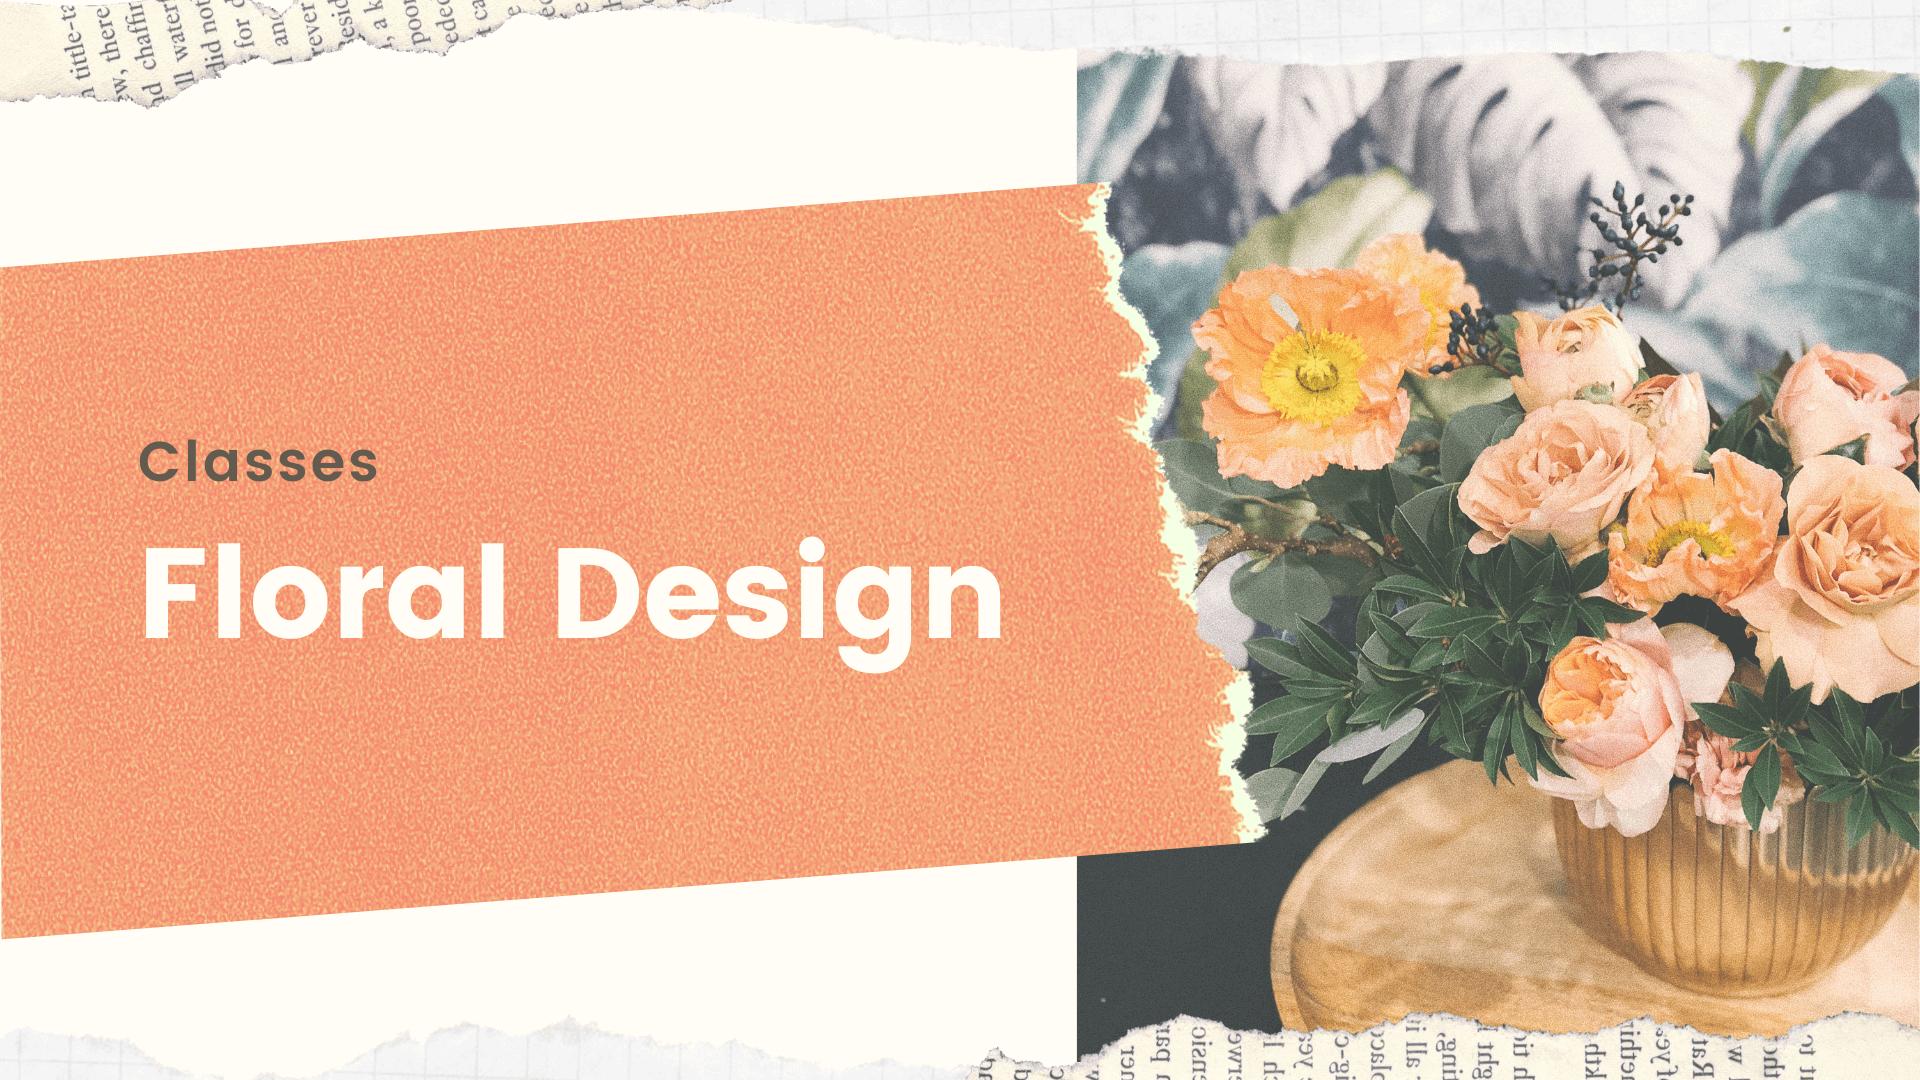 6 Best Floral Design Classes and Courses - Learn Flower Arrangement Online